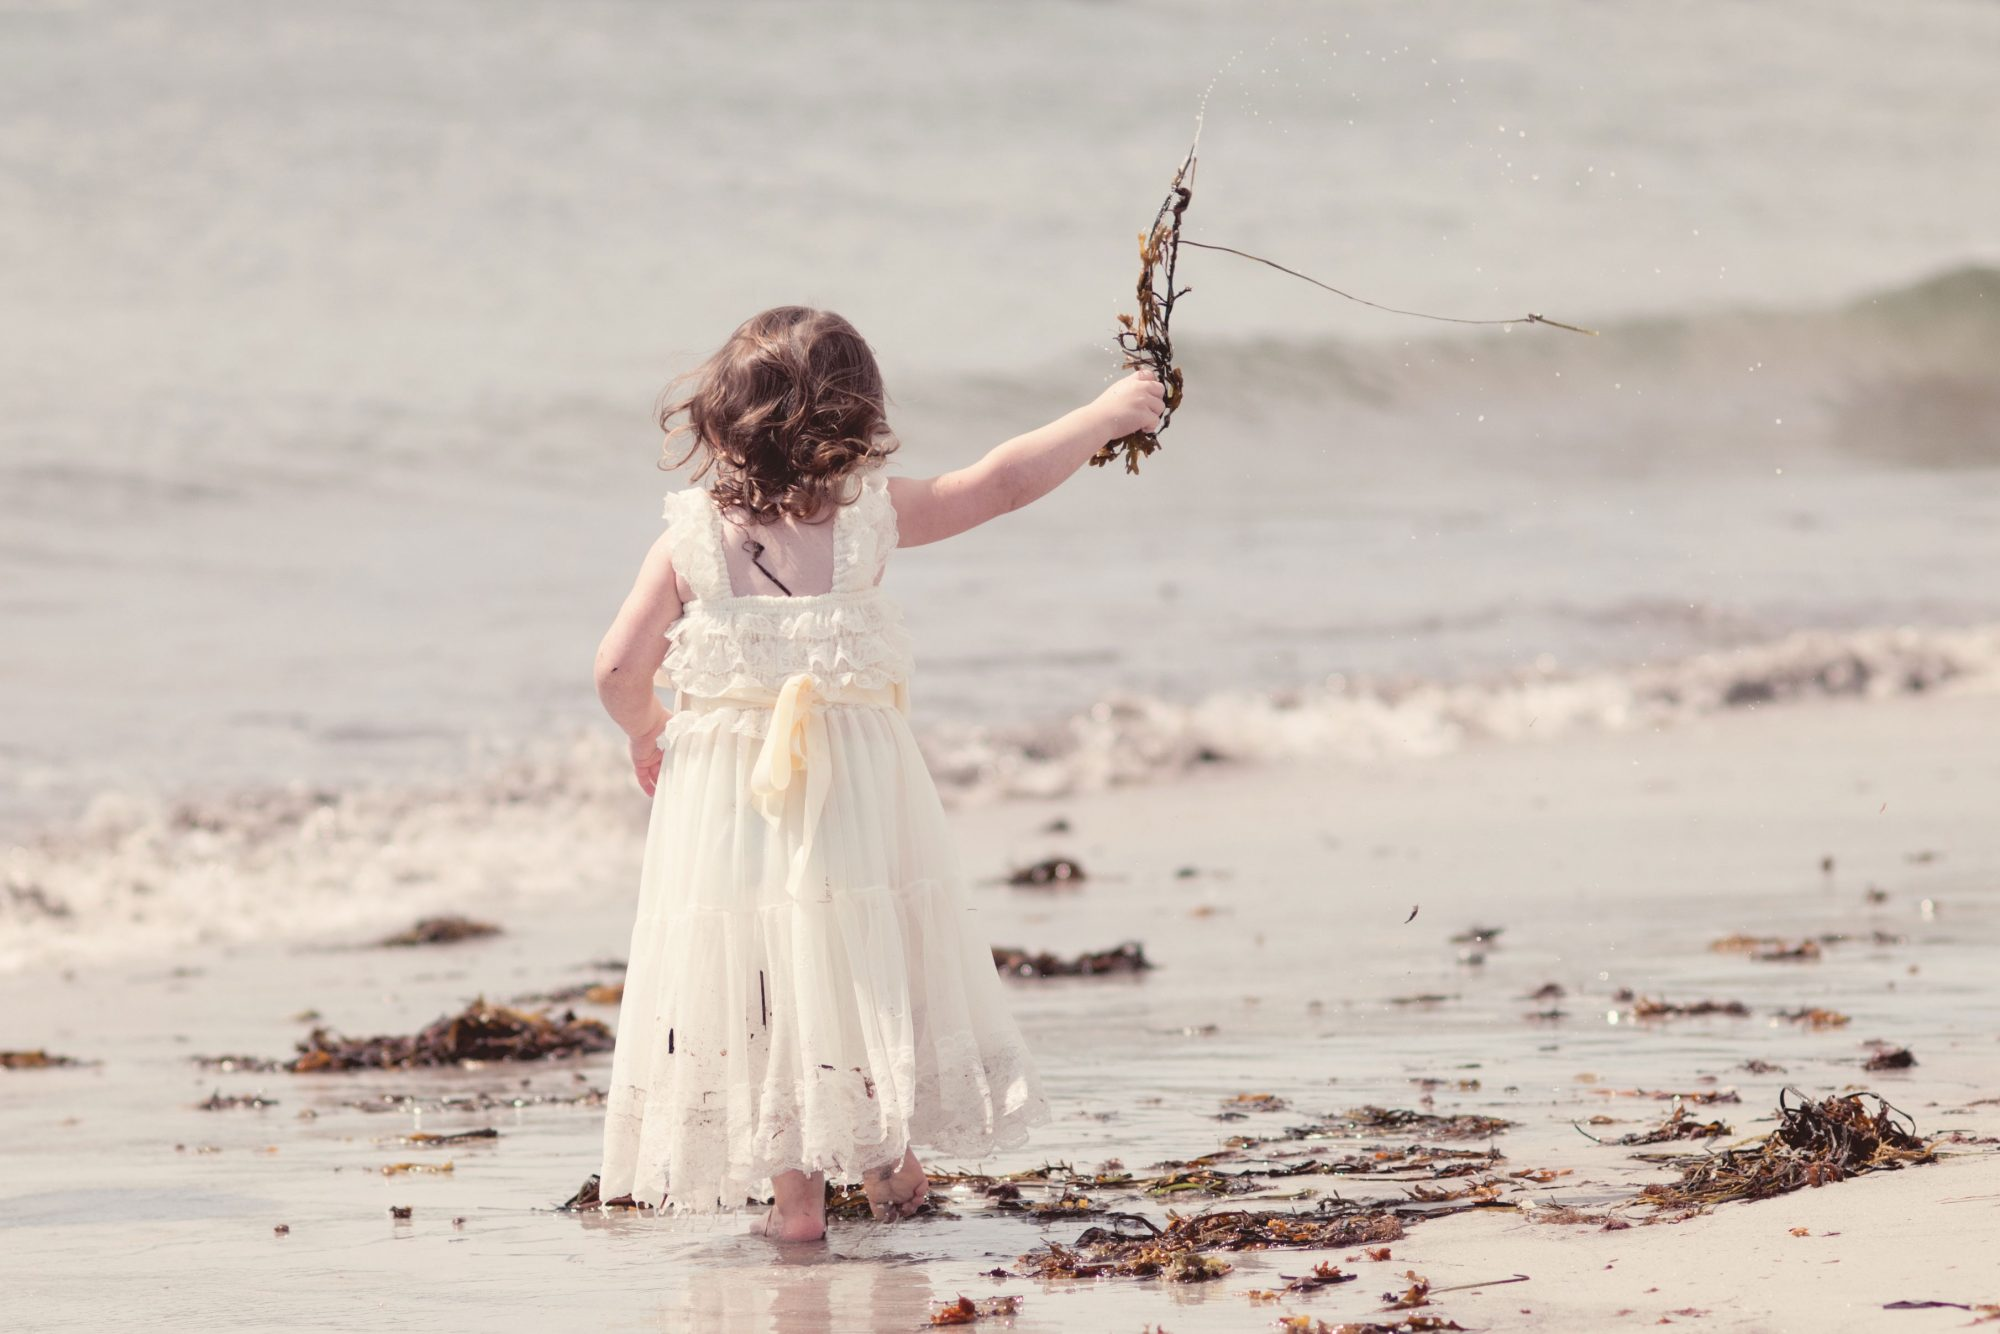 Little girl throwing handfuls of seaweed into the ocean